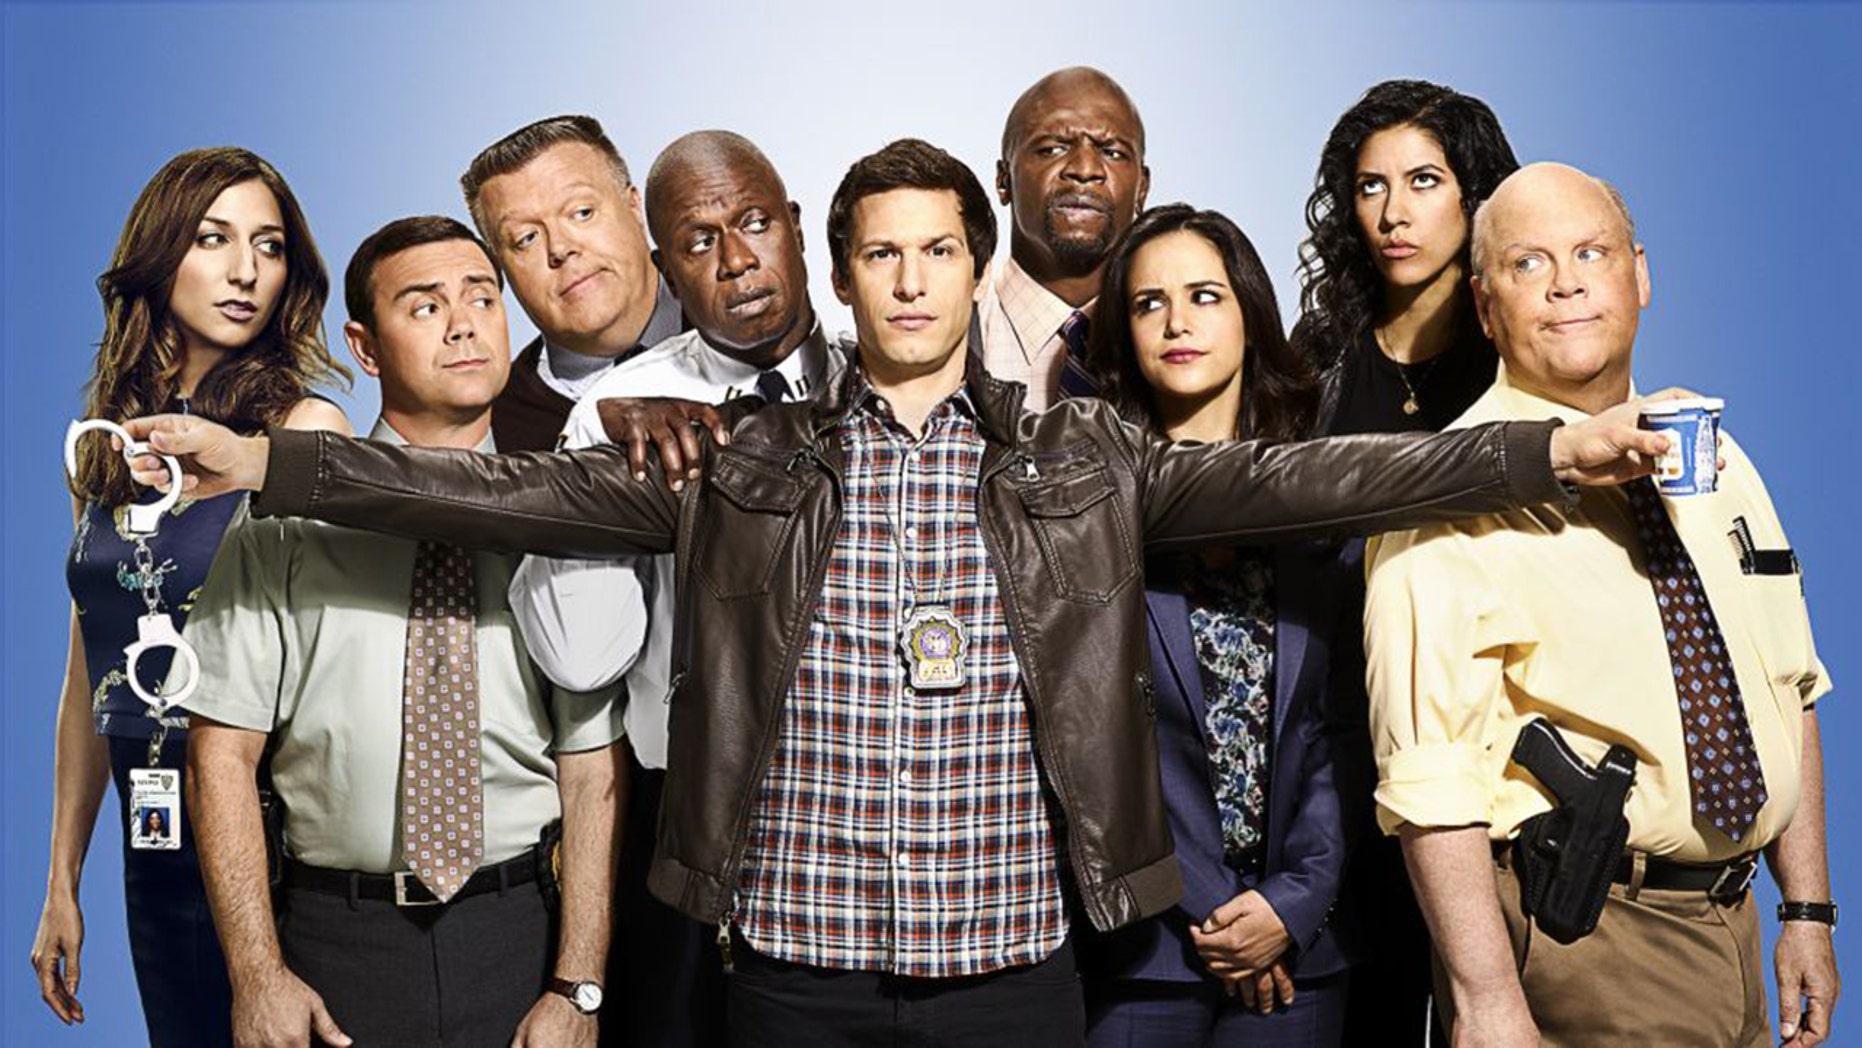 Cast of the sitcom Brooklyn Nine-Nine, starring Andy Samberg (center).